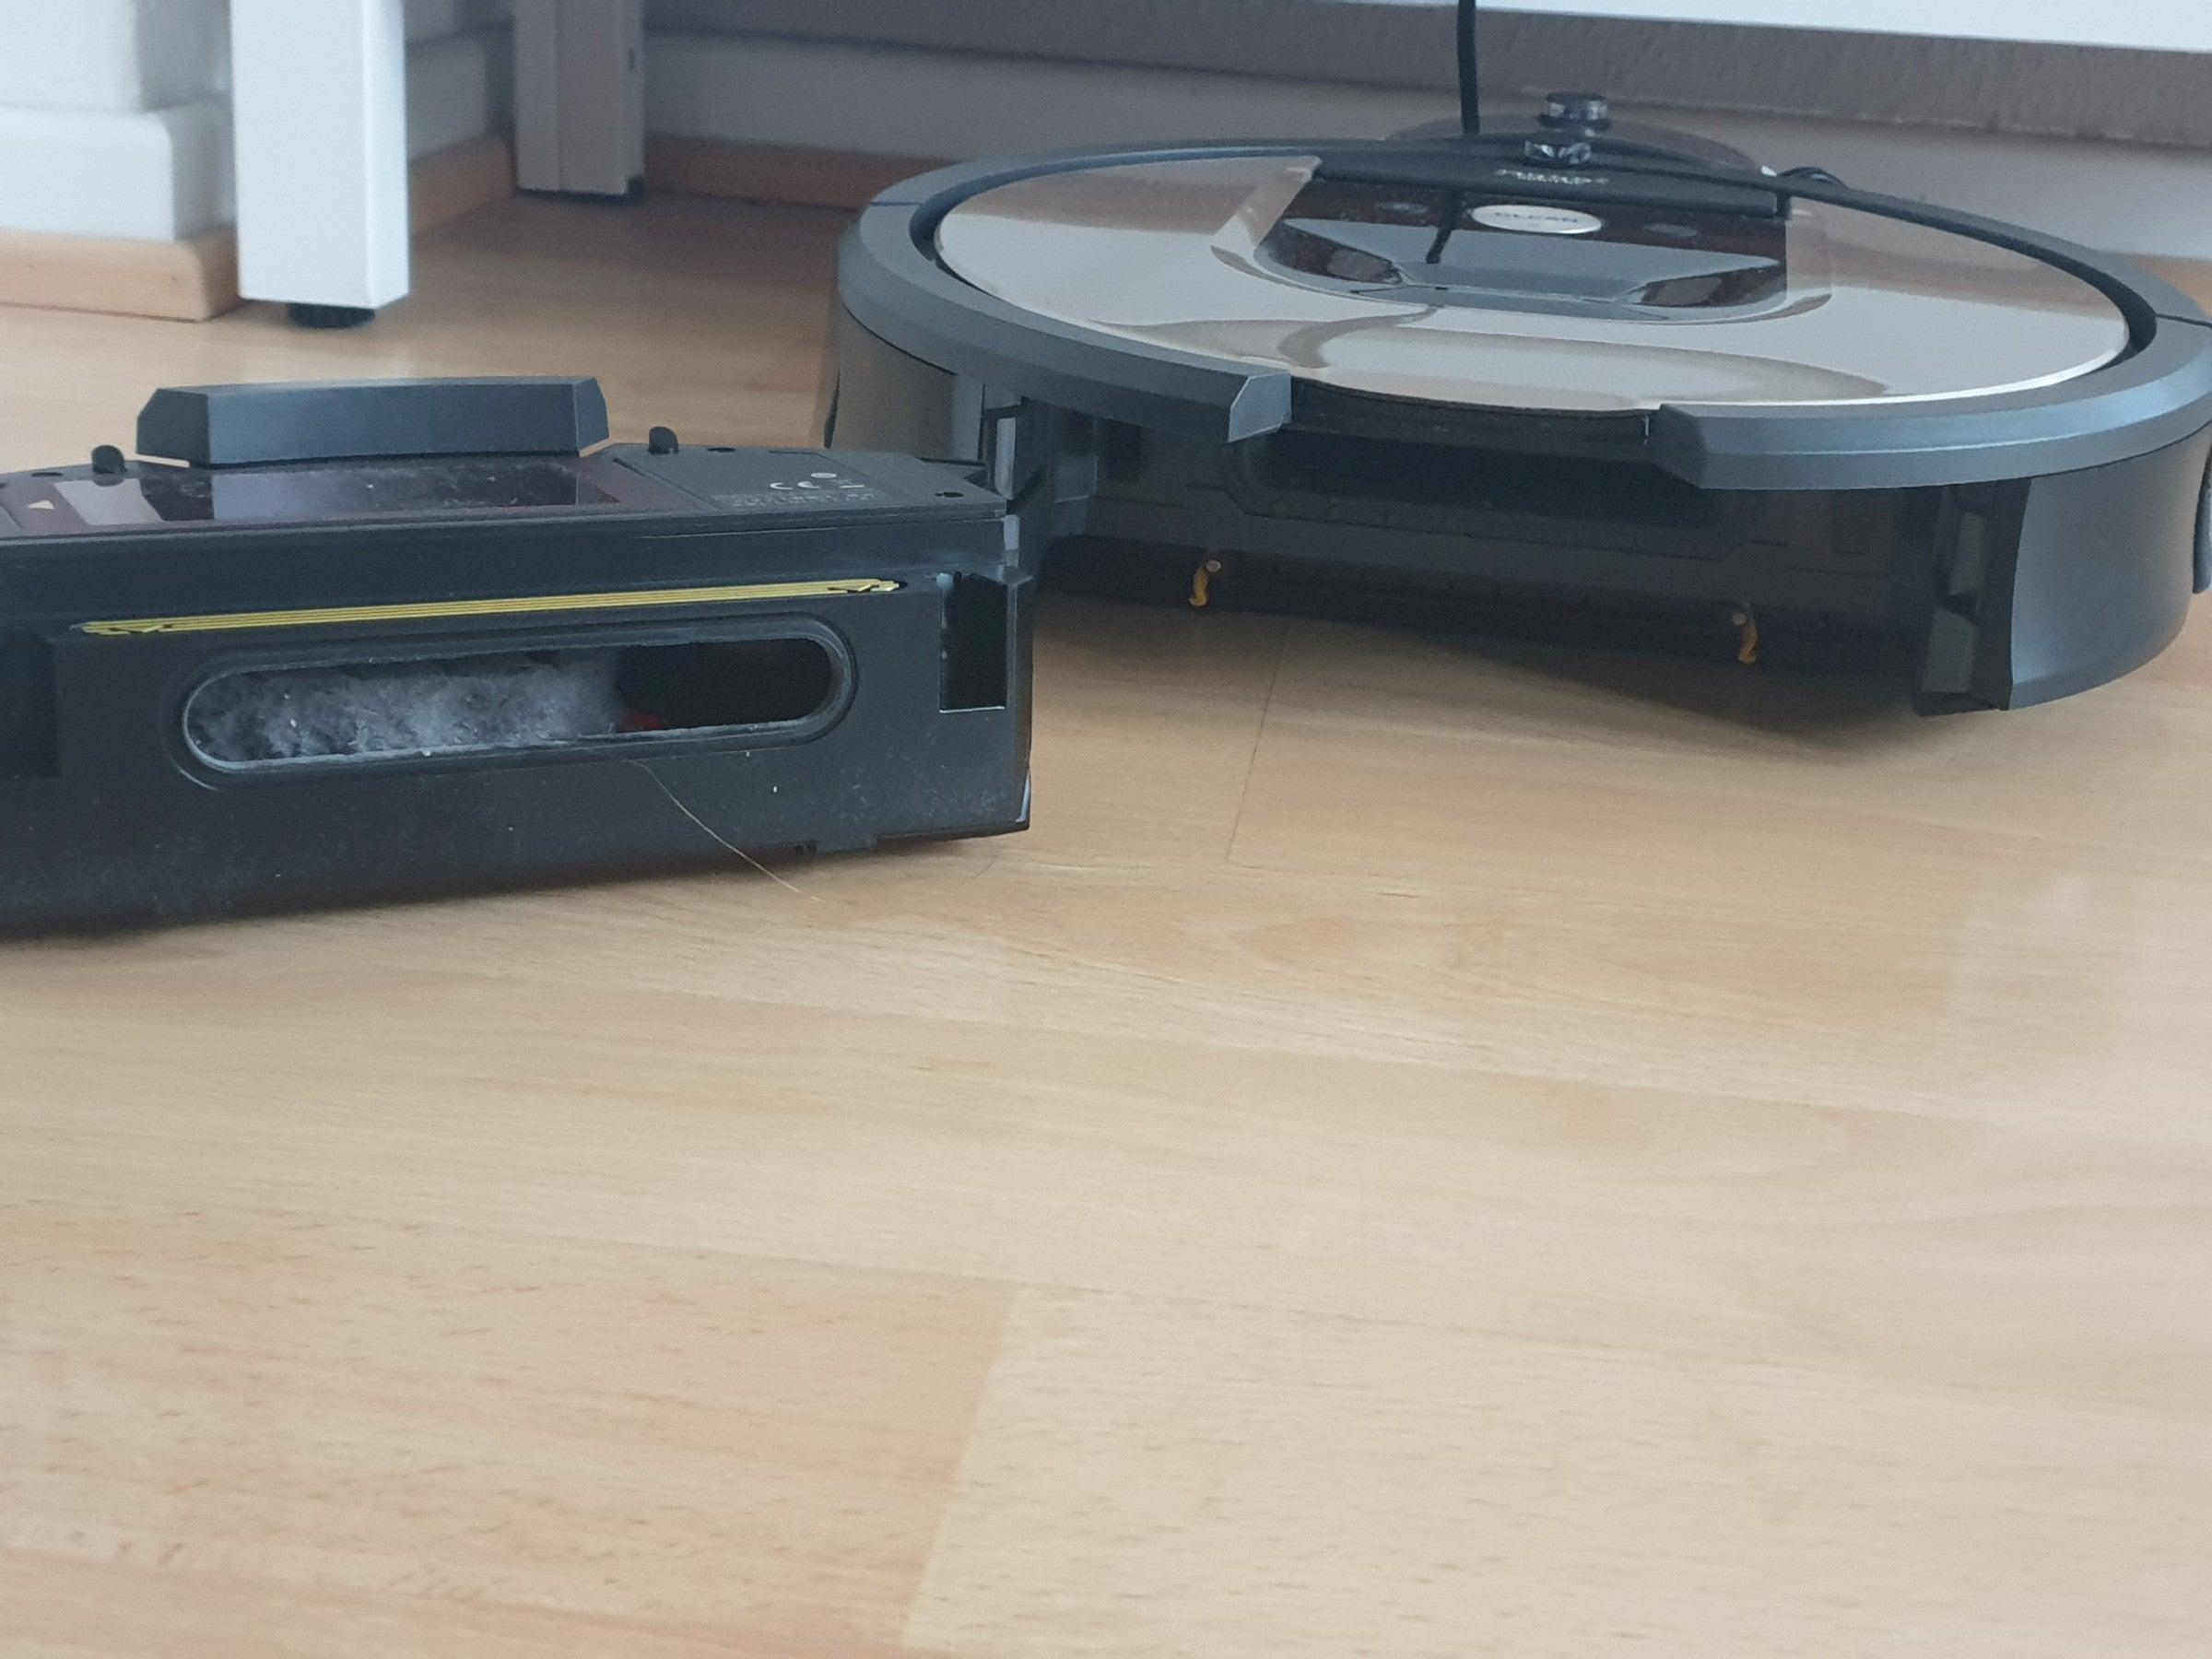 Auffangbehälter aus dem iRobot Roomba 966 ausgebaut